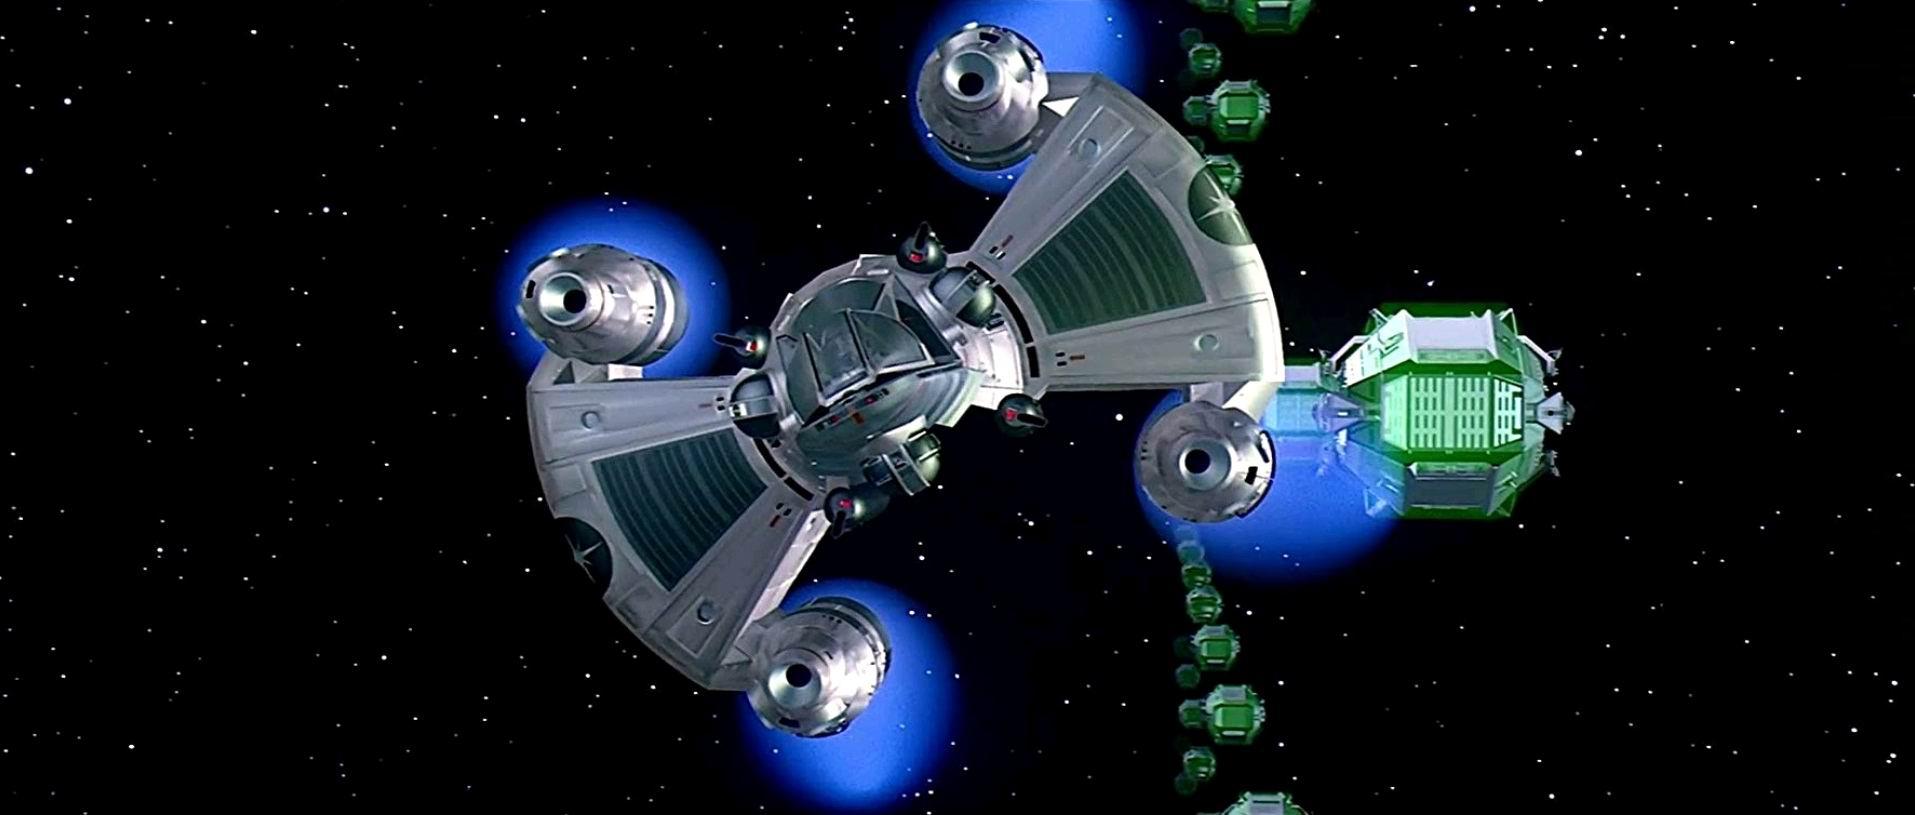 Последний звёздный боец / The Last Starfighter (1984): кадр из фильма